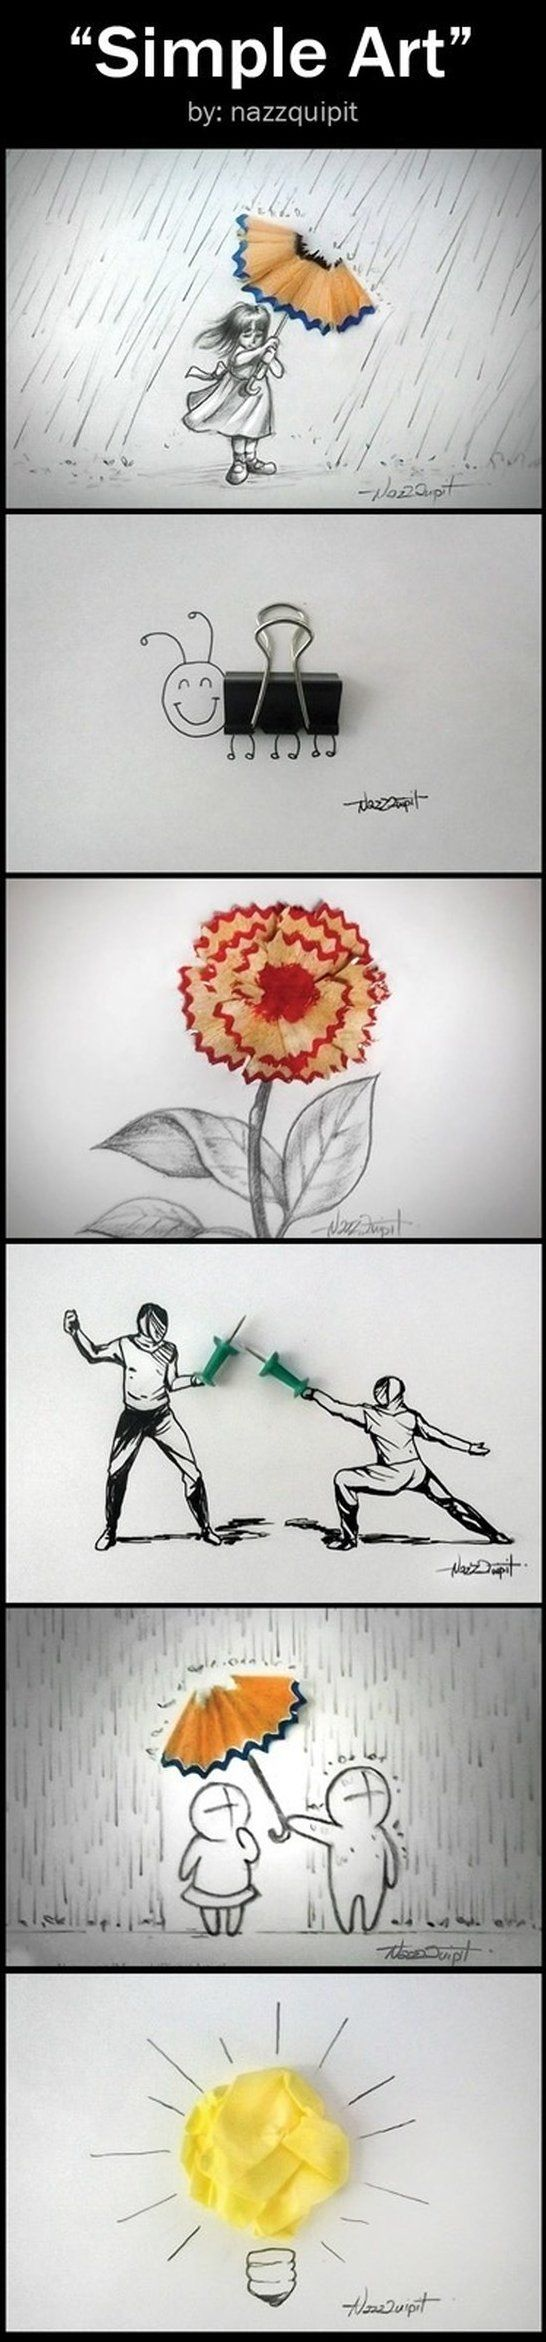 Simple Art - www.meme-lol.com